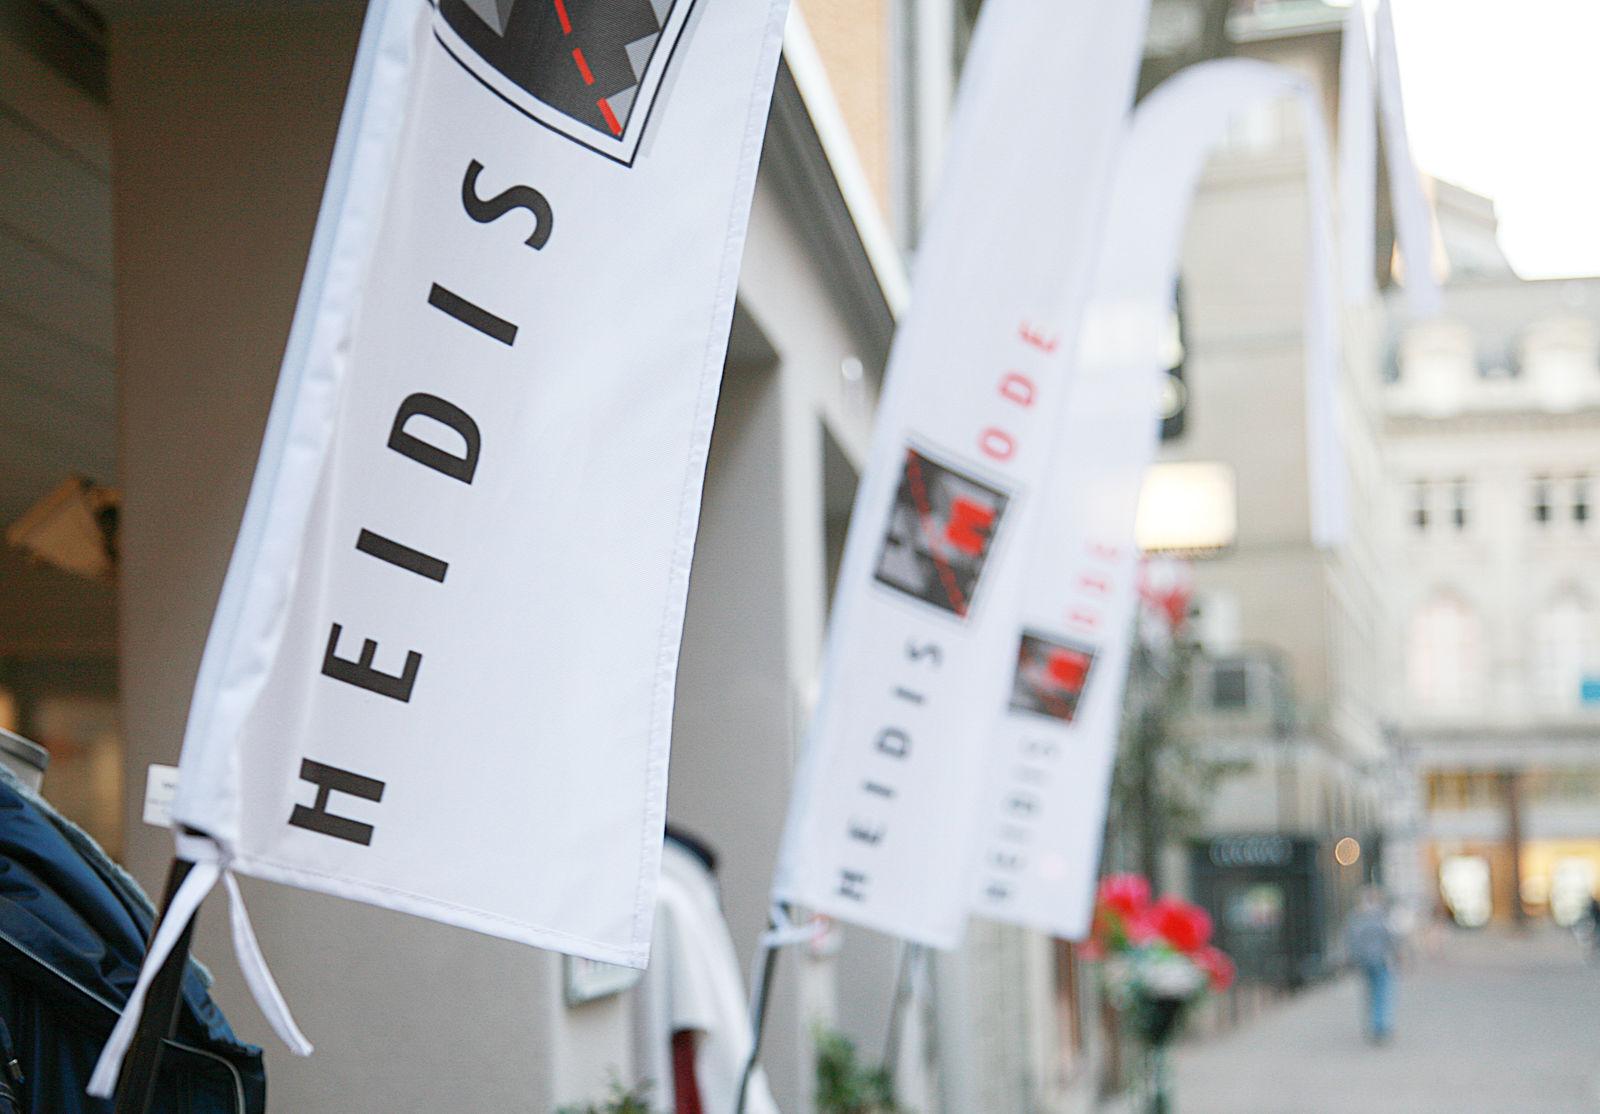 Heidis Mode - grosse Grössen in St. Gallen (Bild 1)